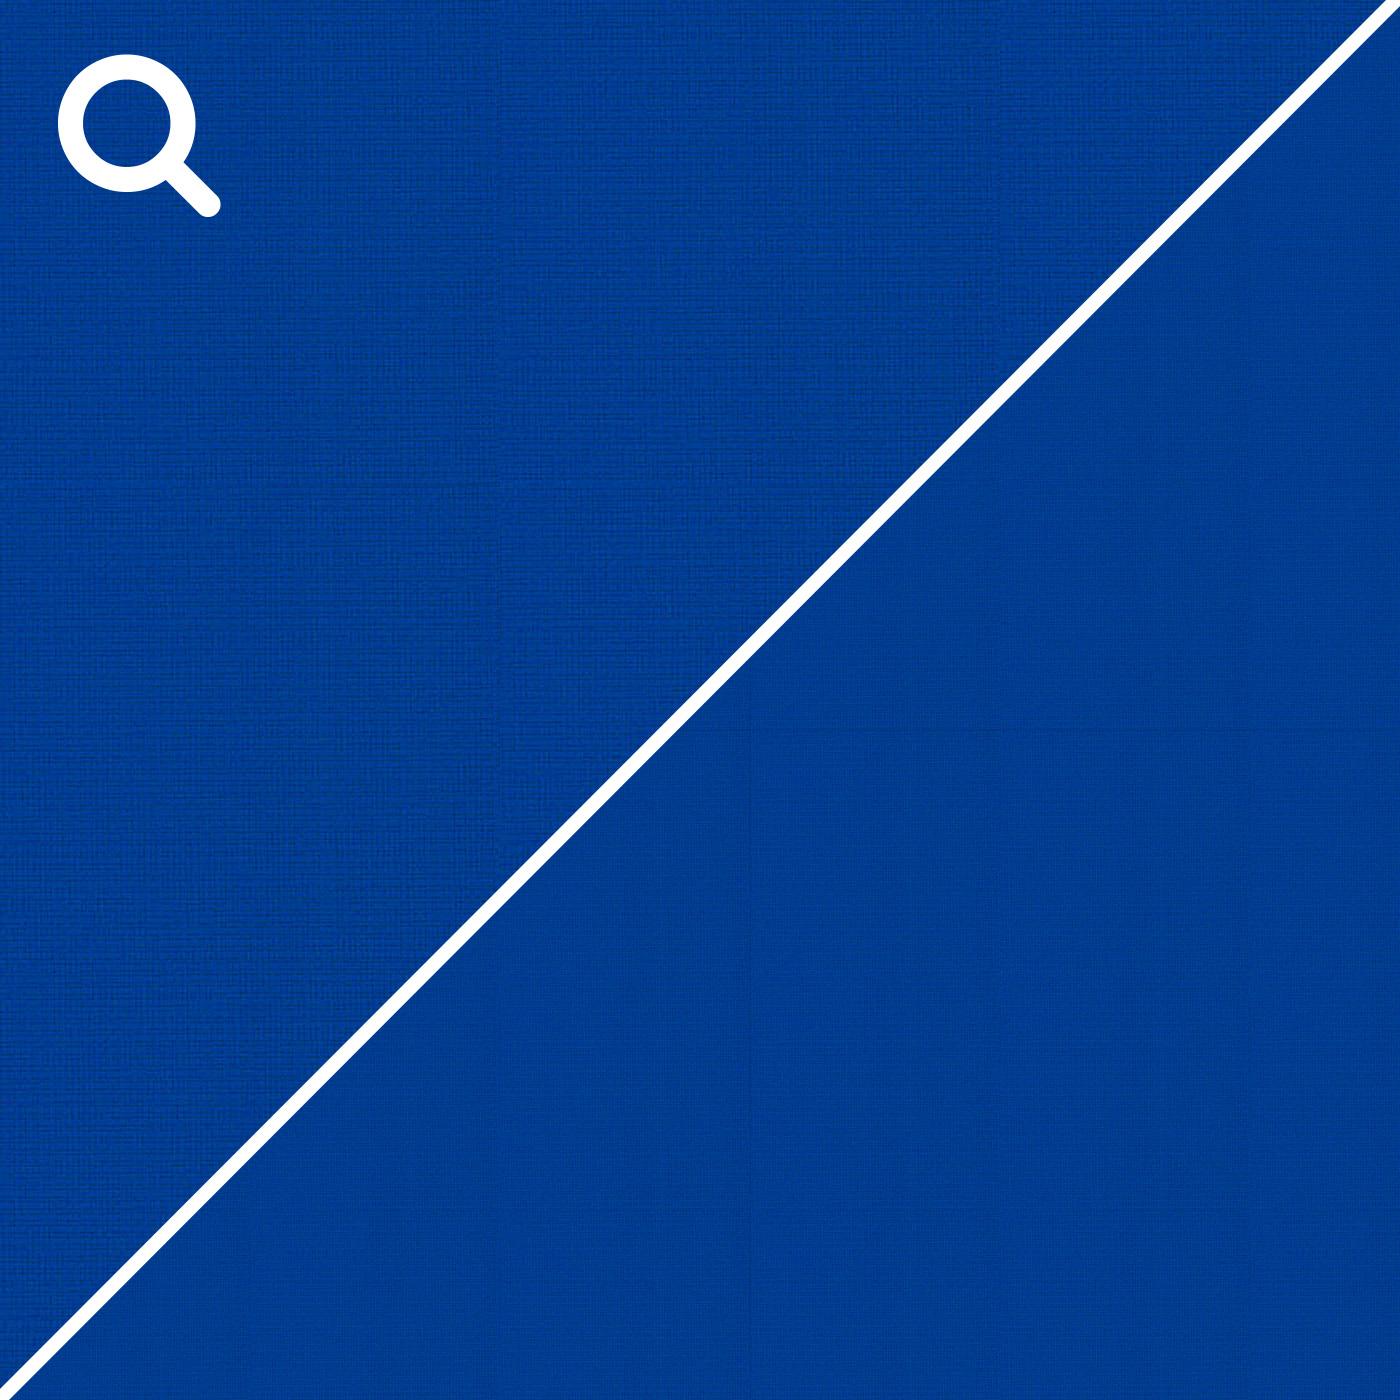 3-61-blau